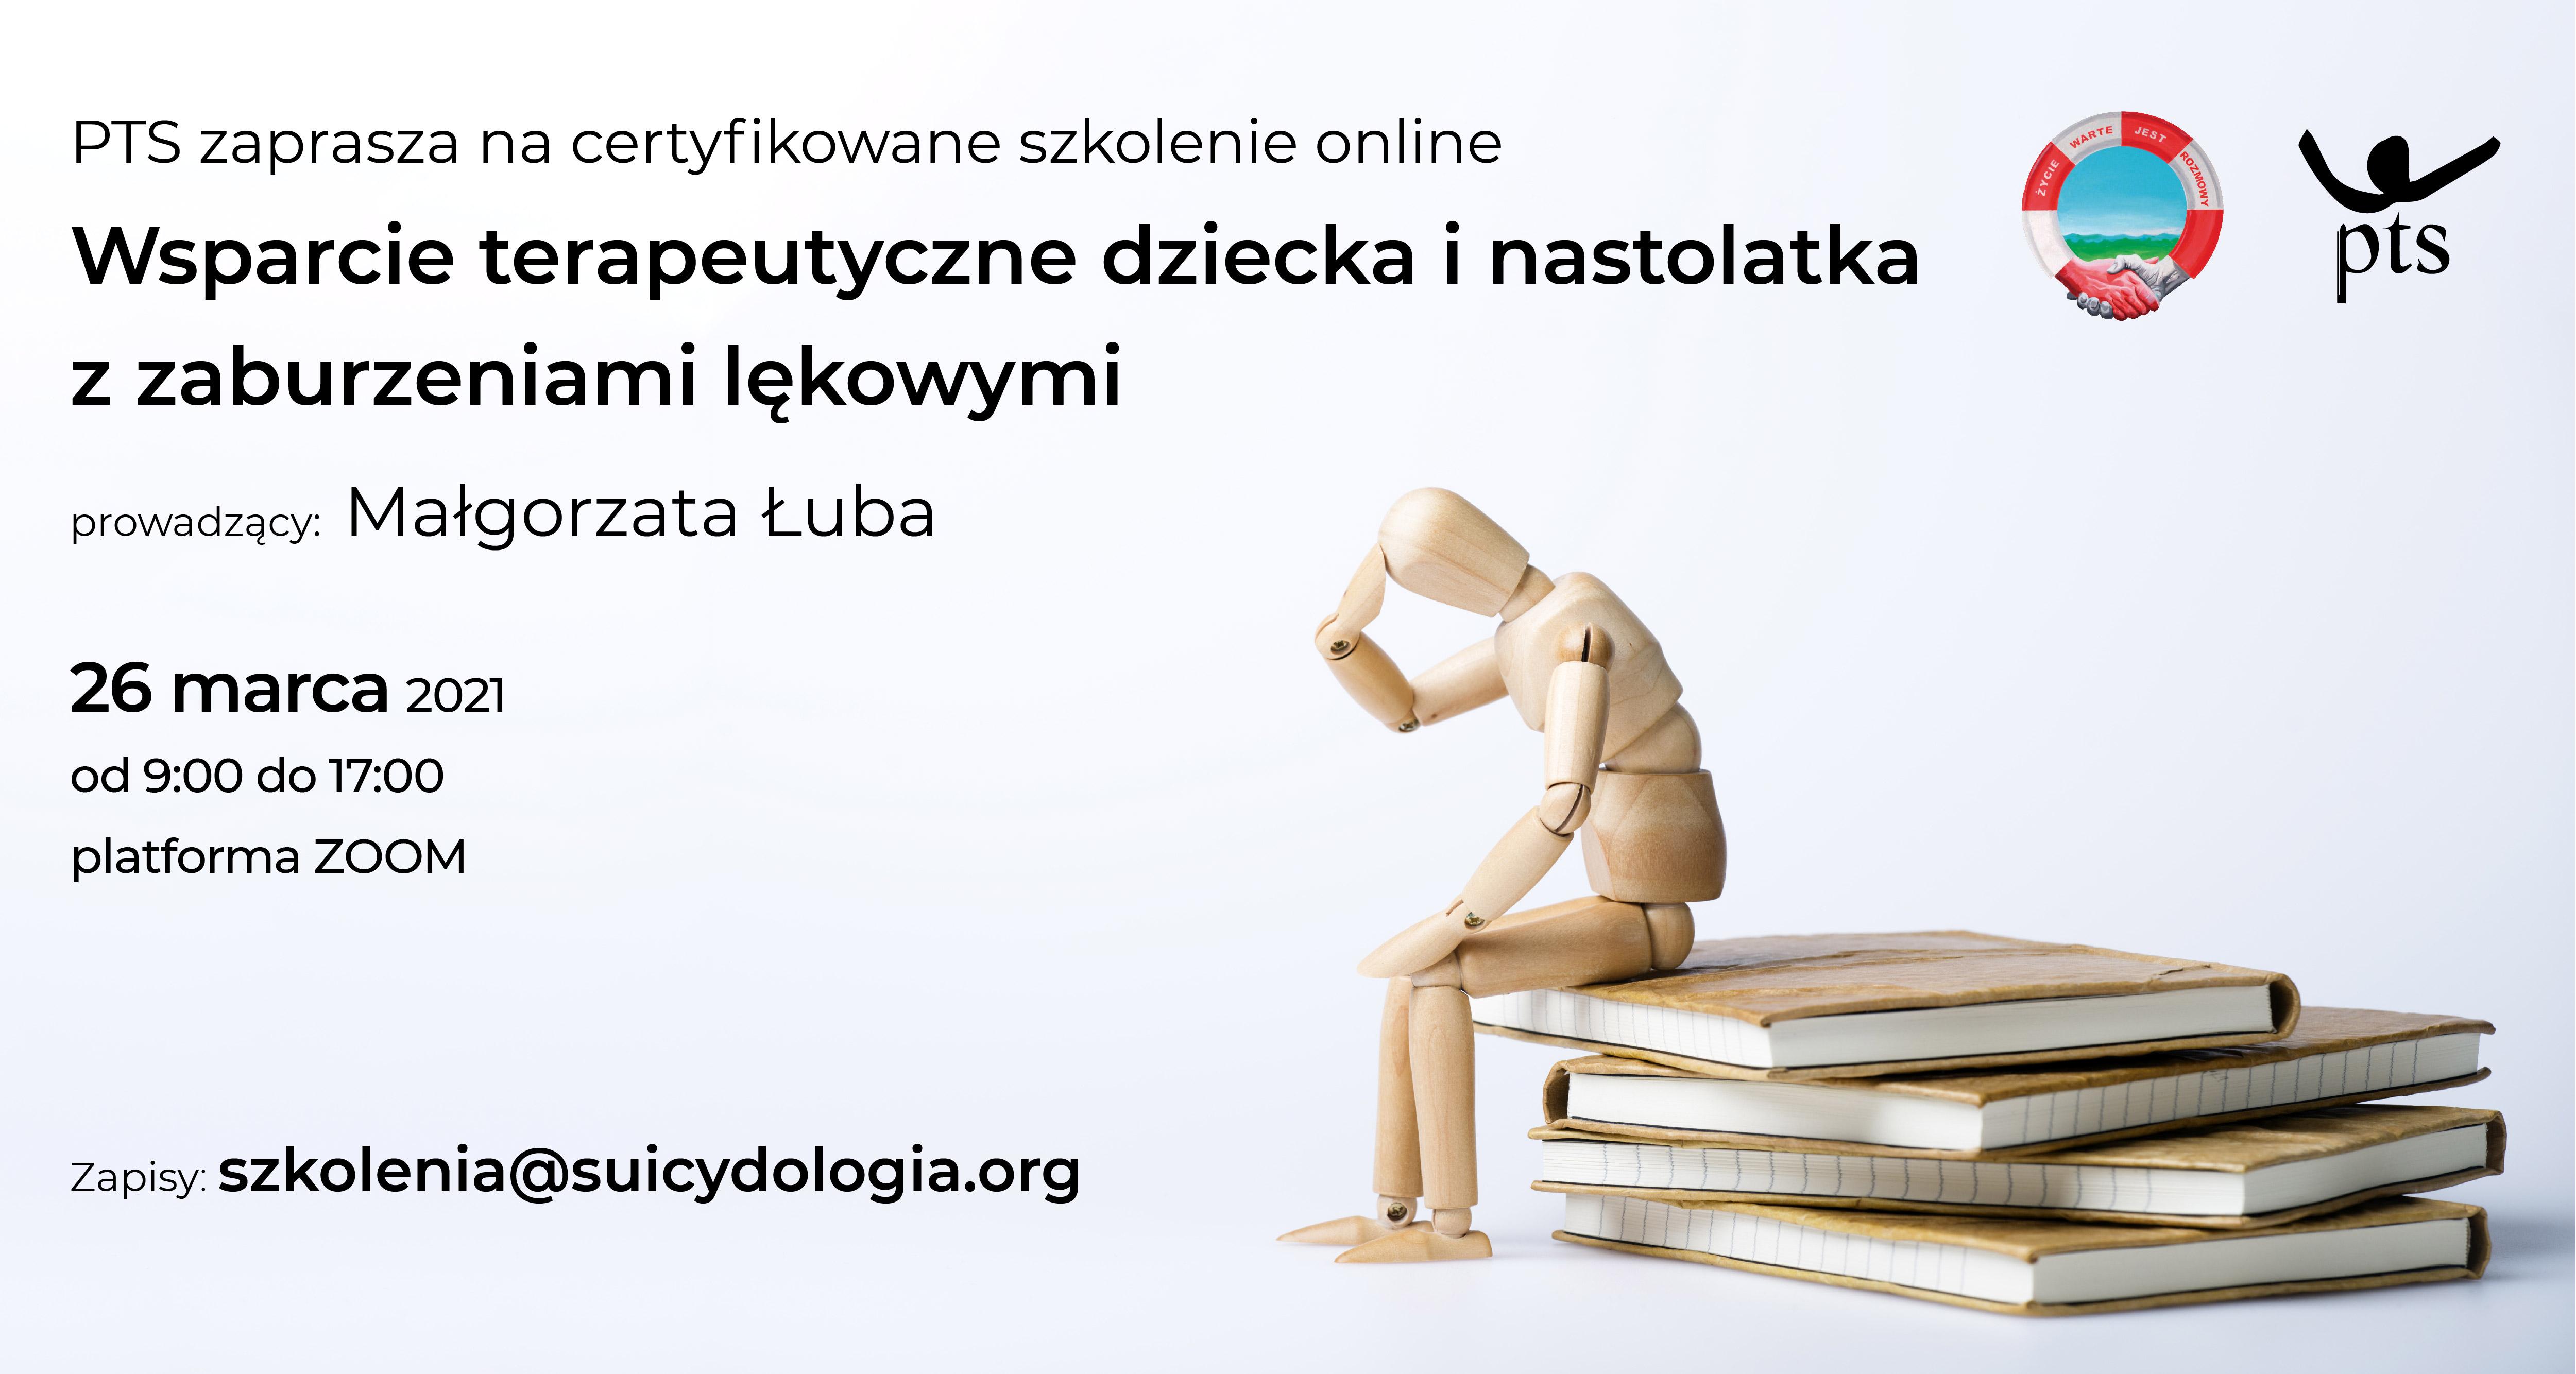 plakaty_nowy_termin-15